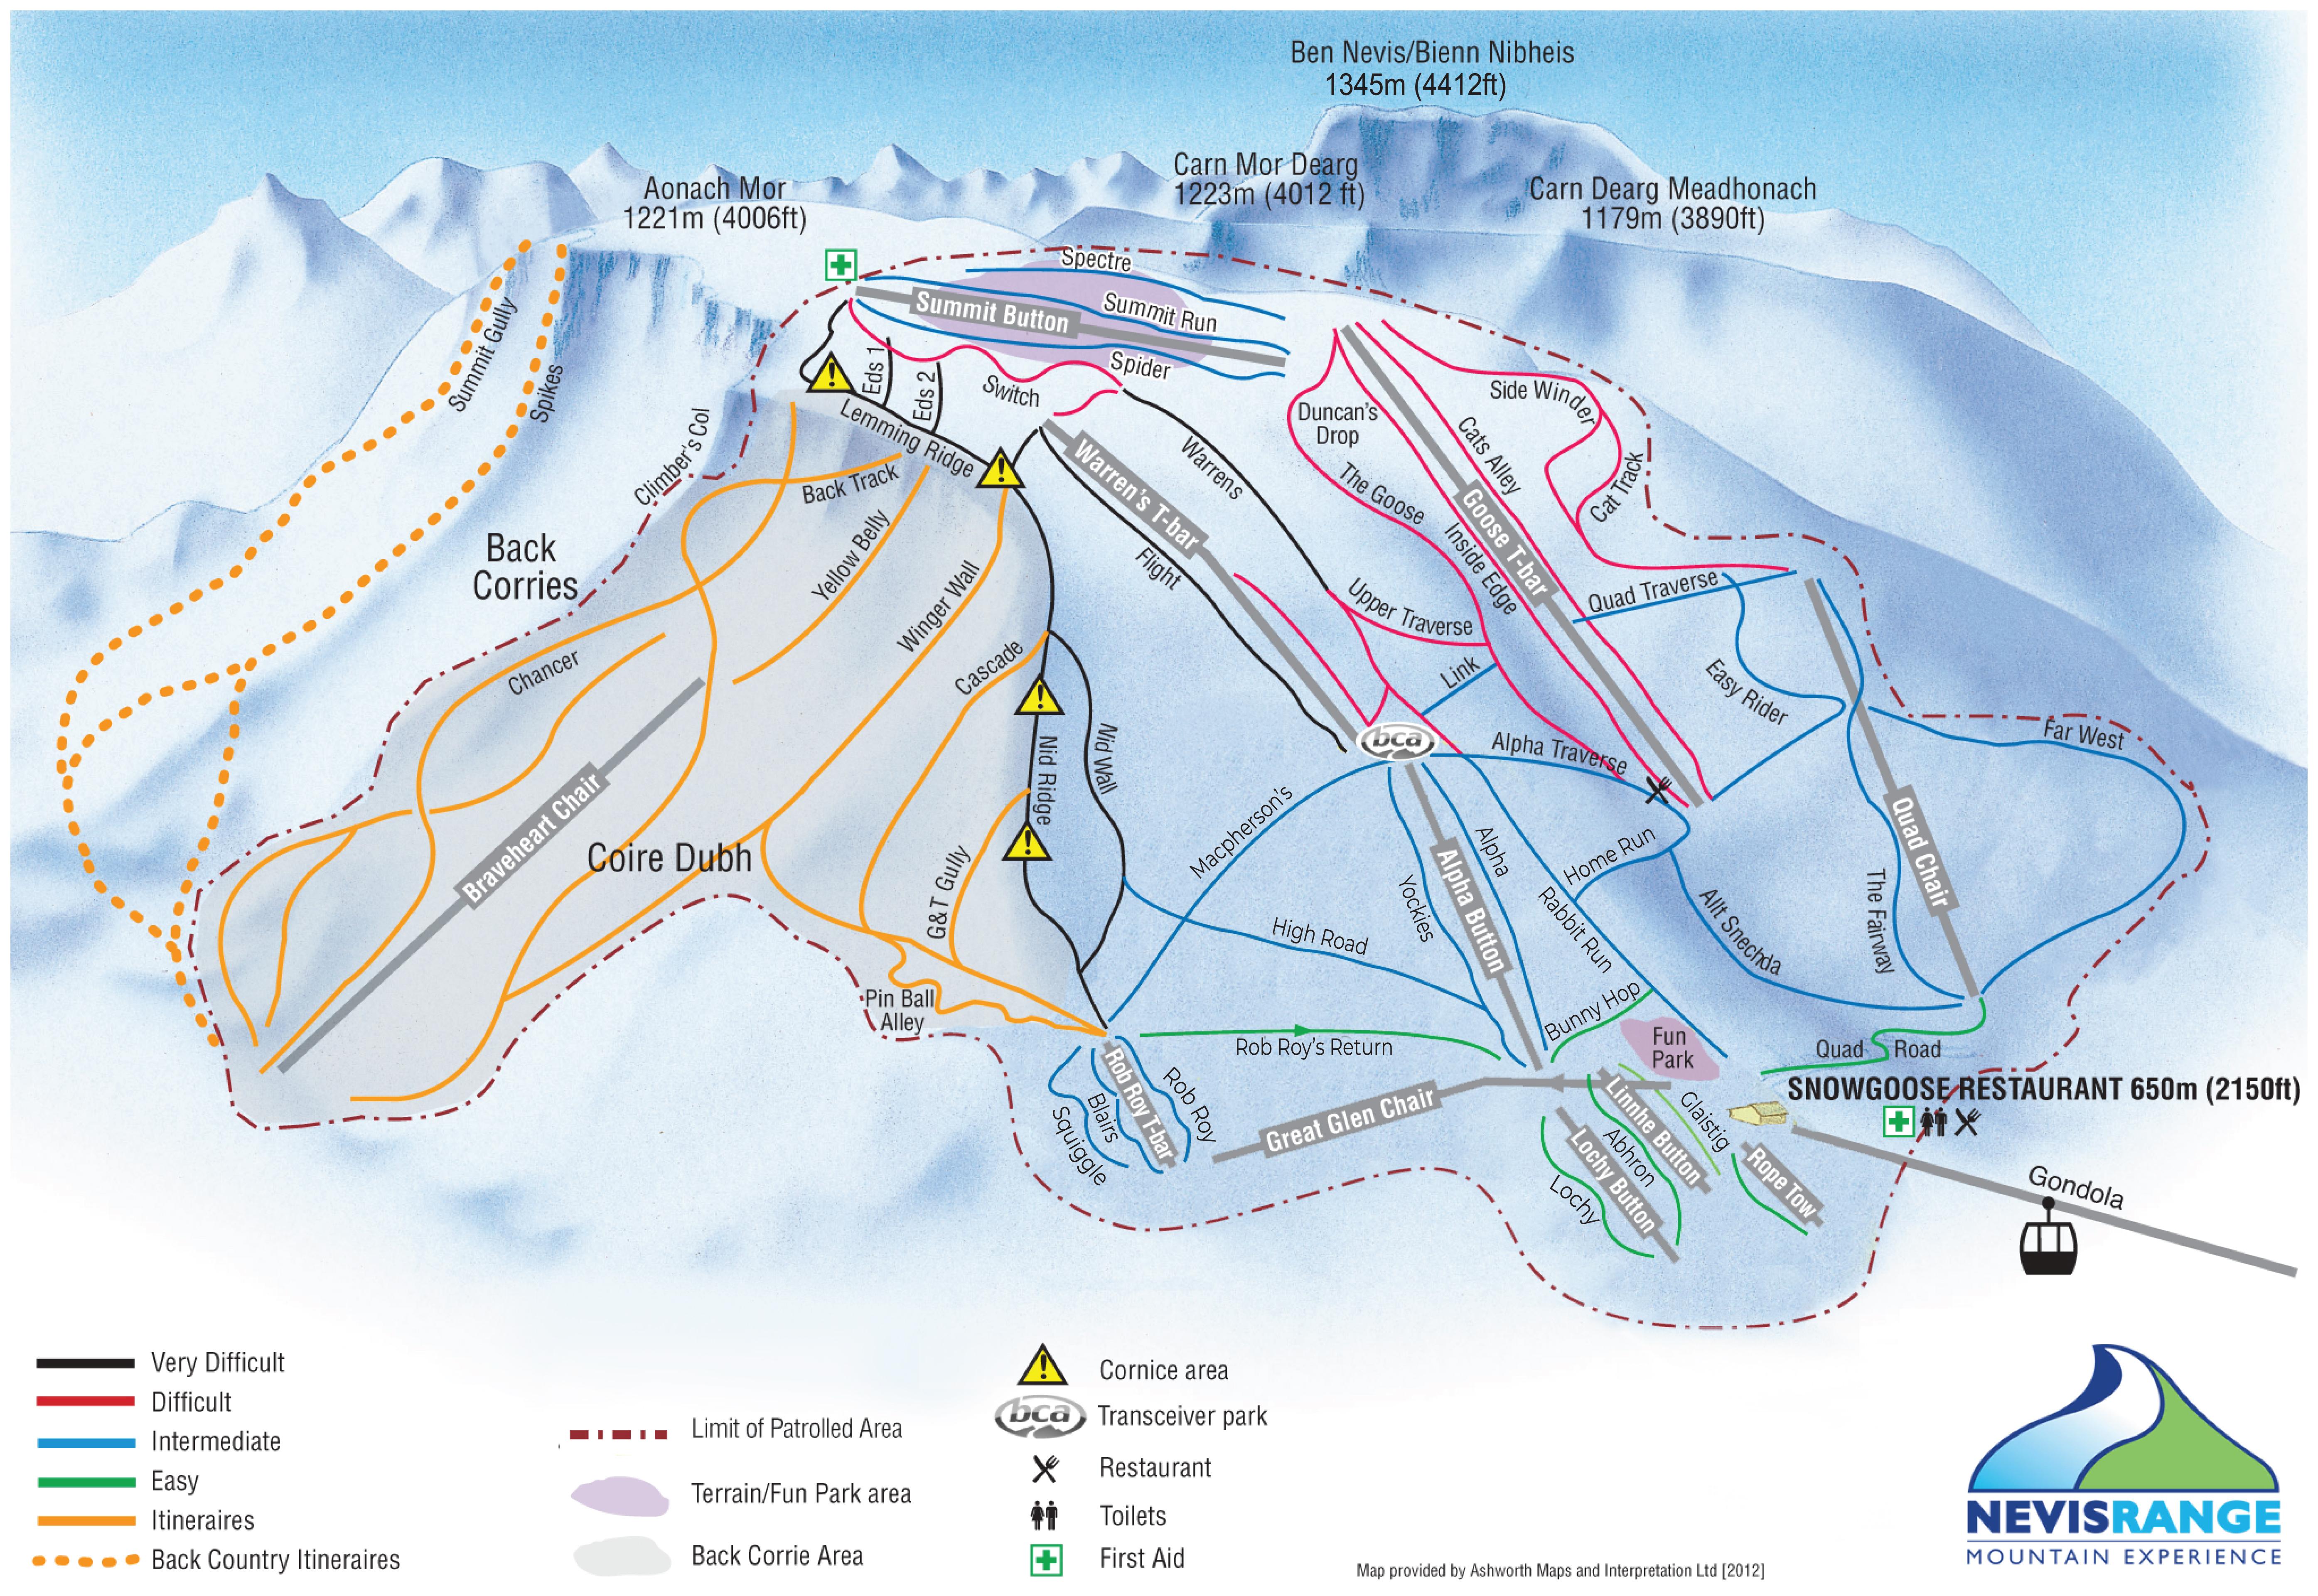 Fort Williams Scotland Map.Ski Board At Nevis Range